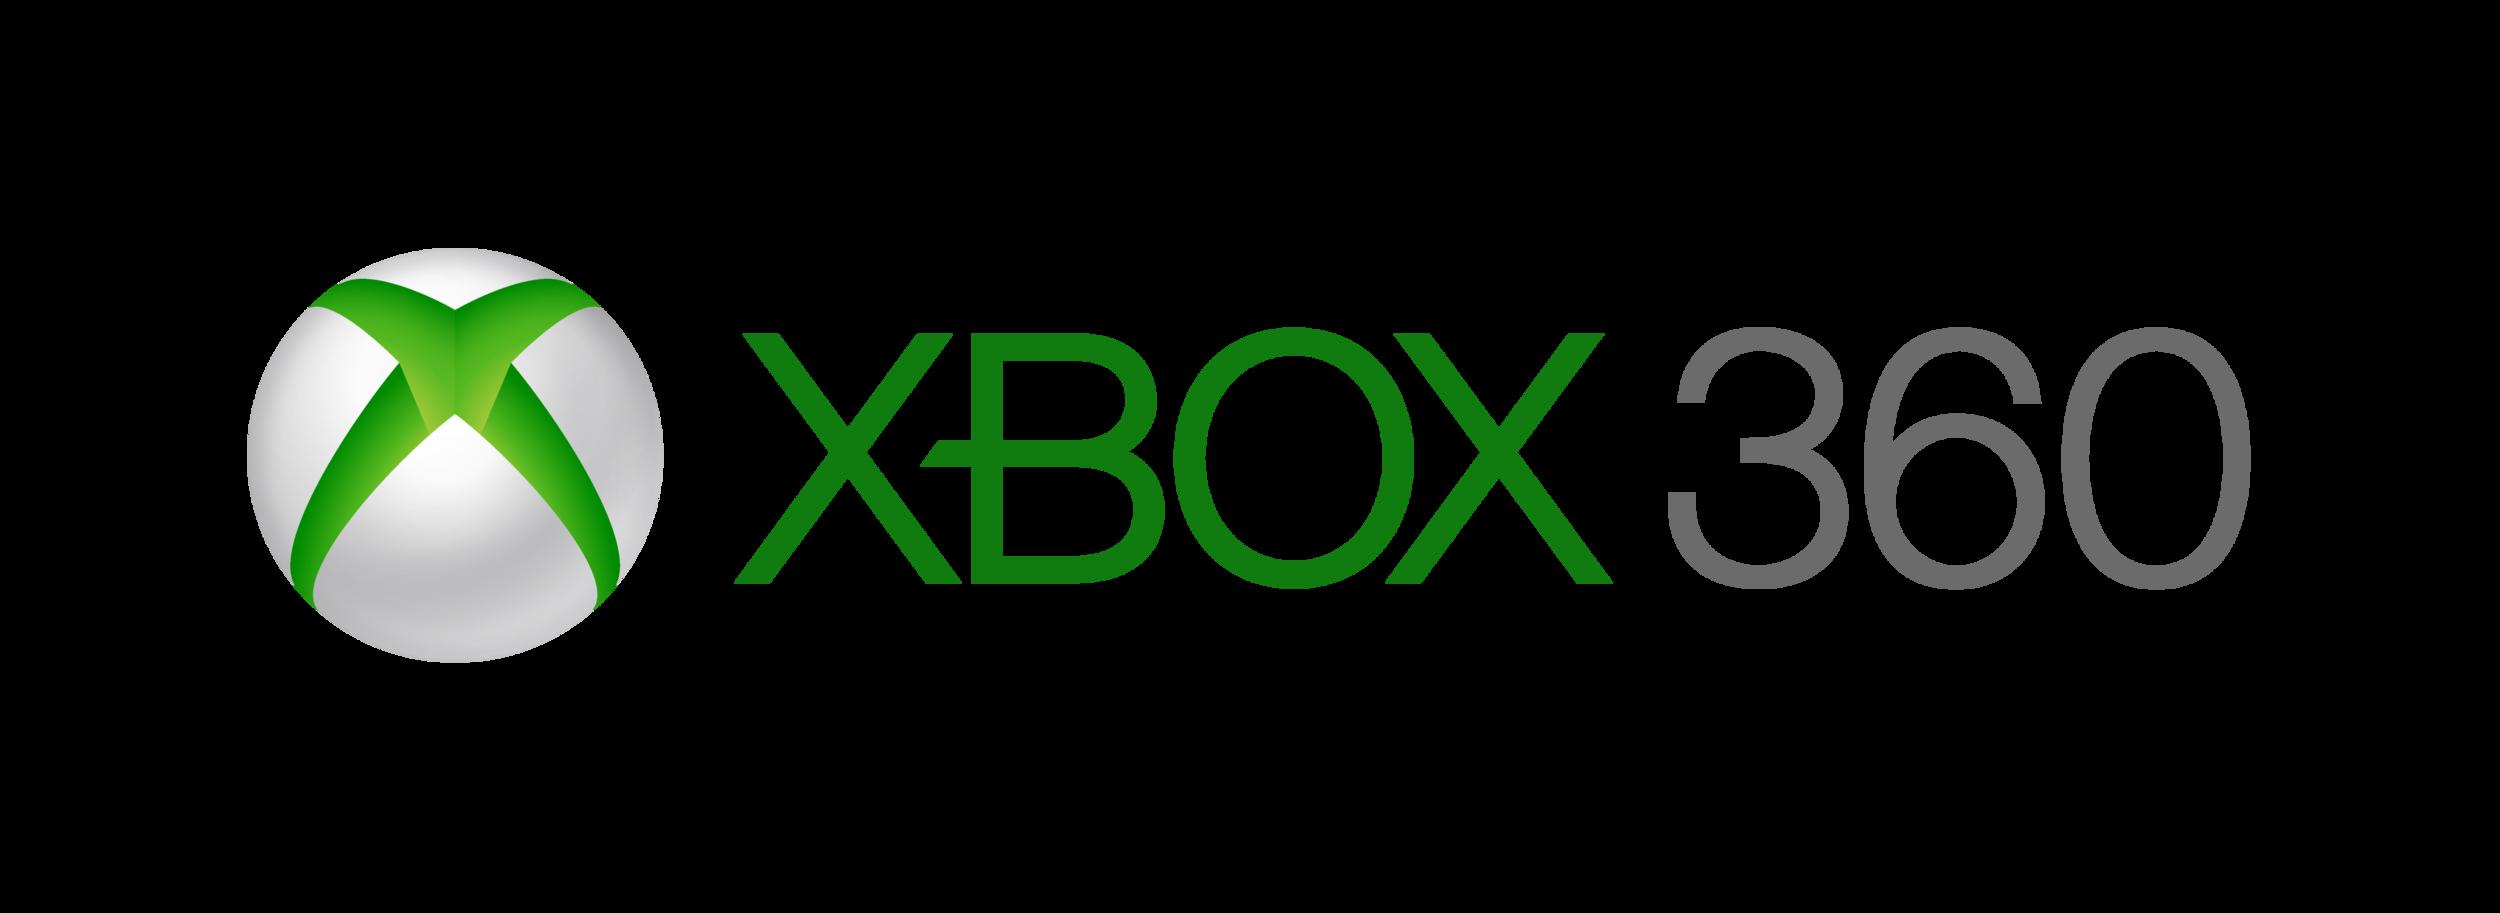 Xbox360 logo.png